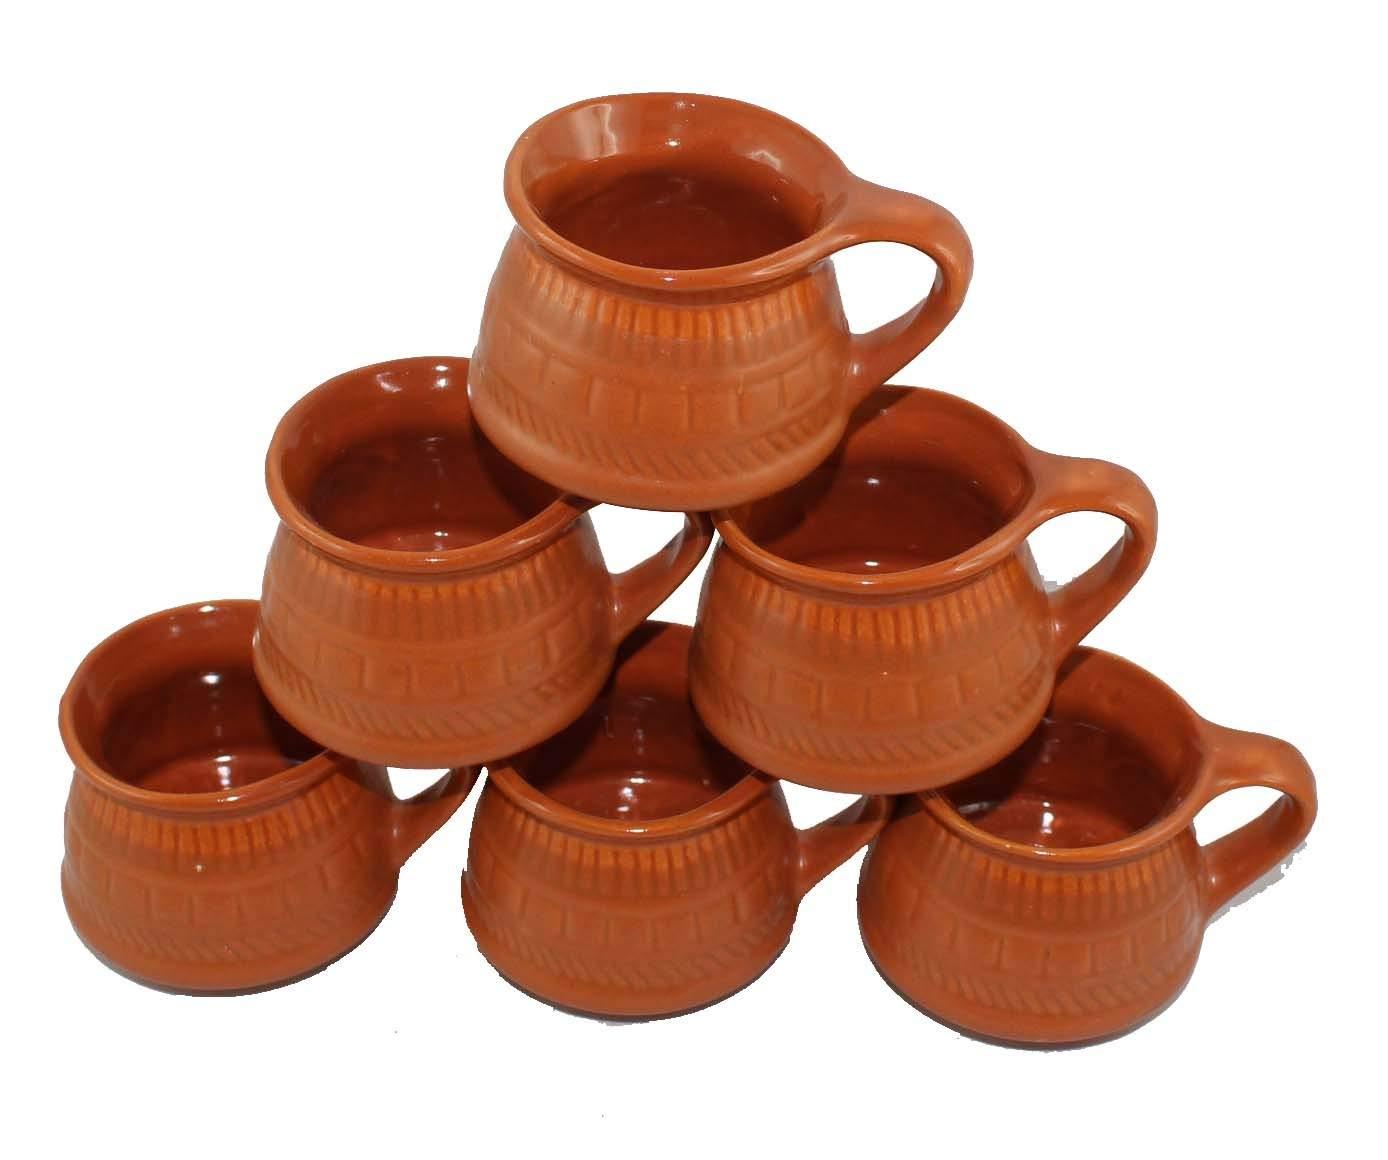 Creativegifts Ceramic Kulhar Cups Reusable Traditional Indian Chai Tea Cup (Set of 6. 100 ml each)